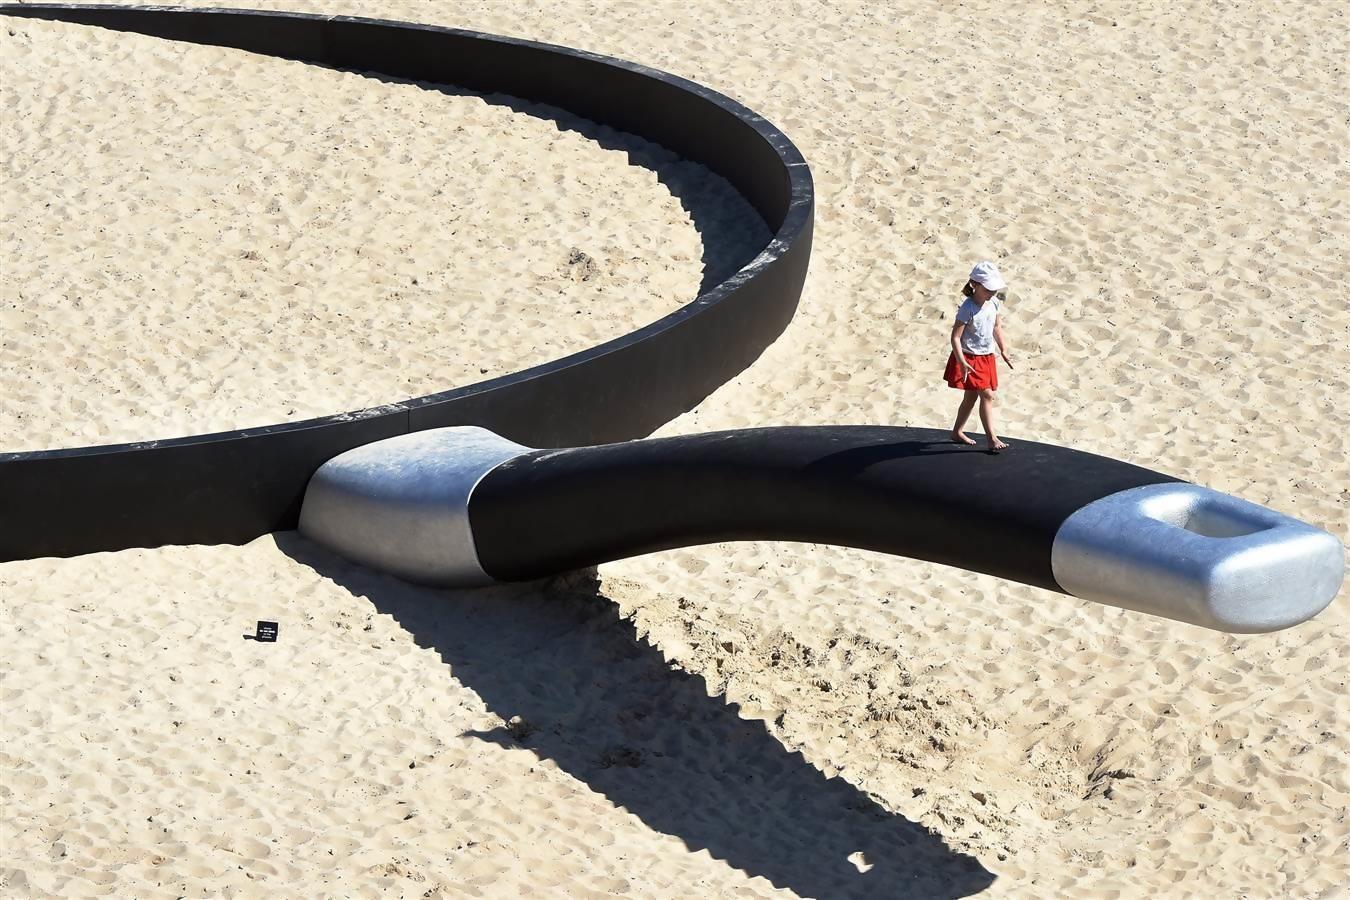 A Frying pan beach sculpture in Sydney, Australia.